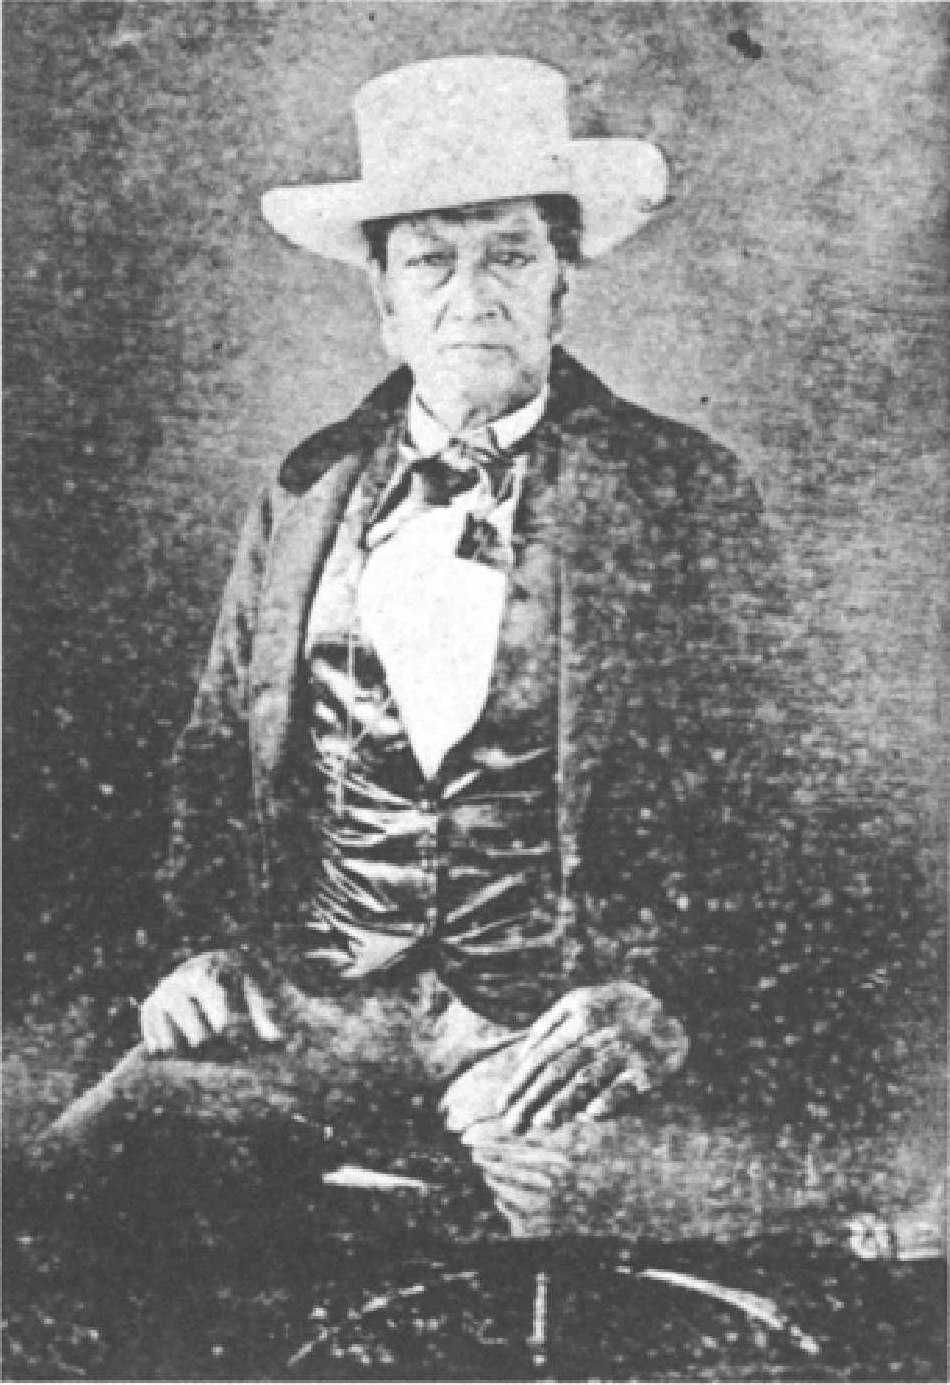 James Young Kanehoa